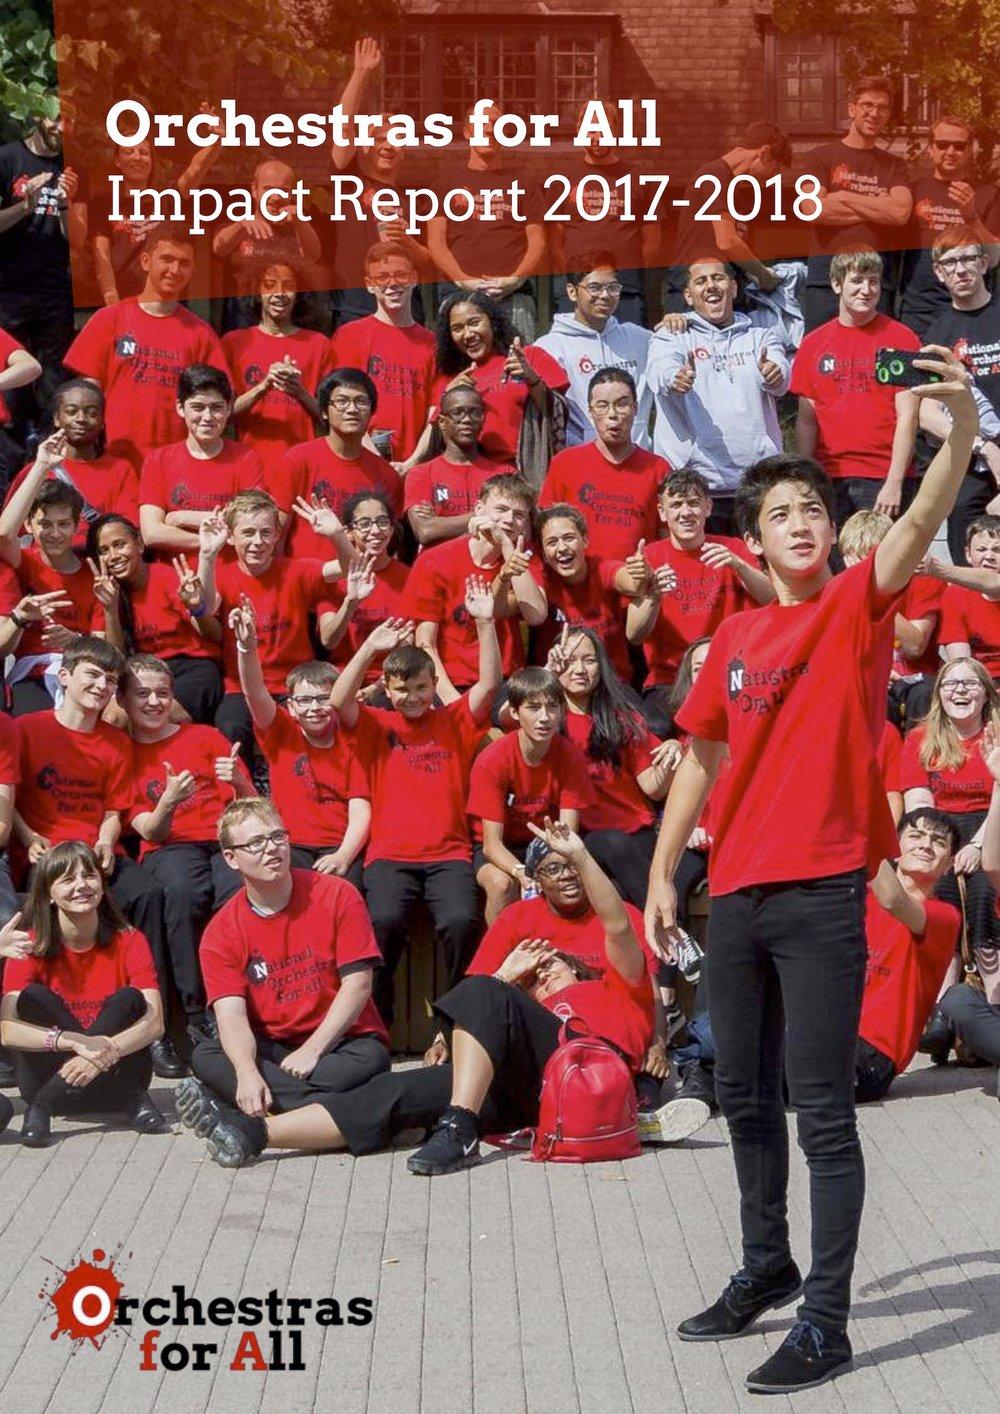 Impact Report 2017-2018